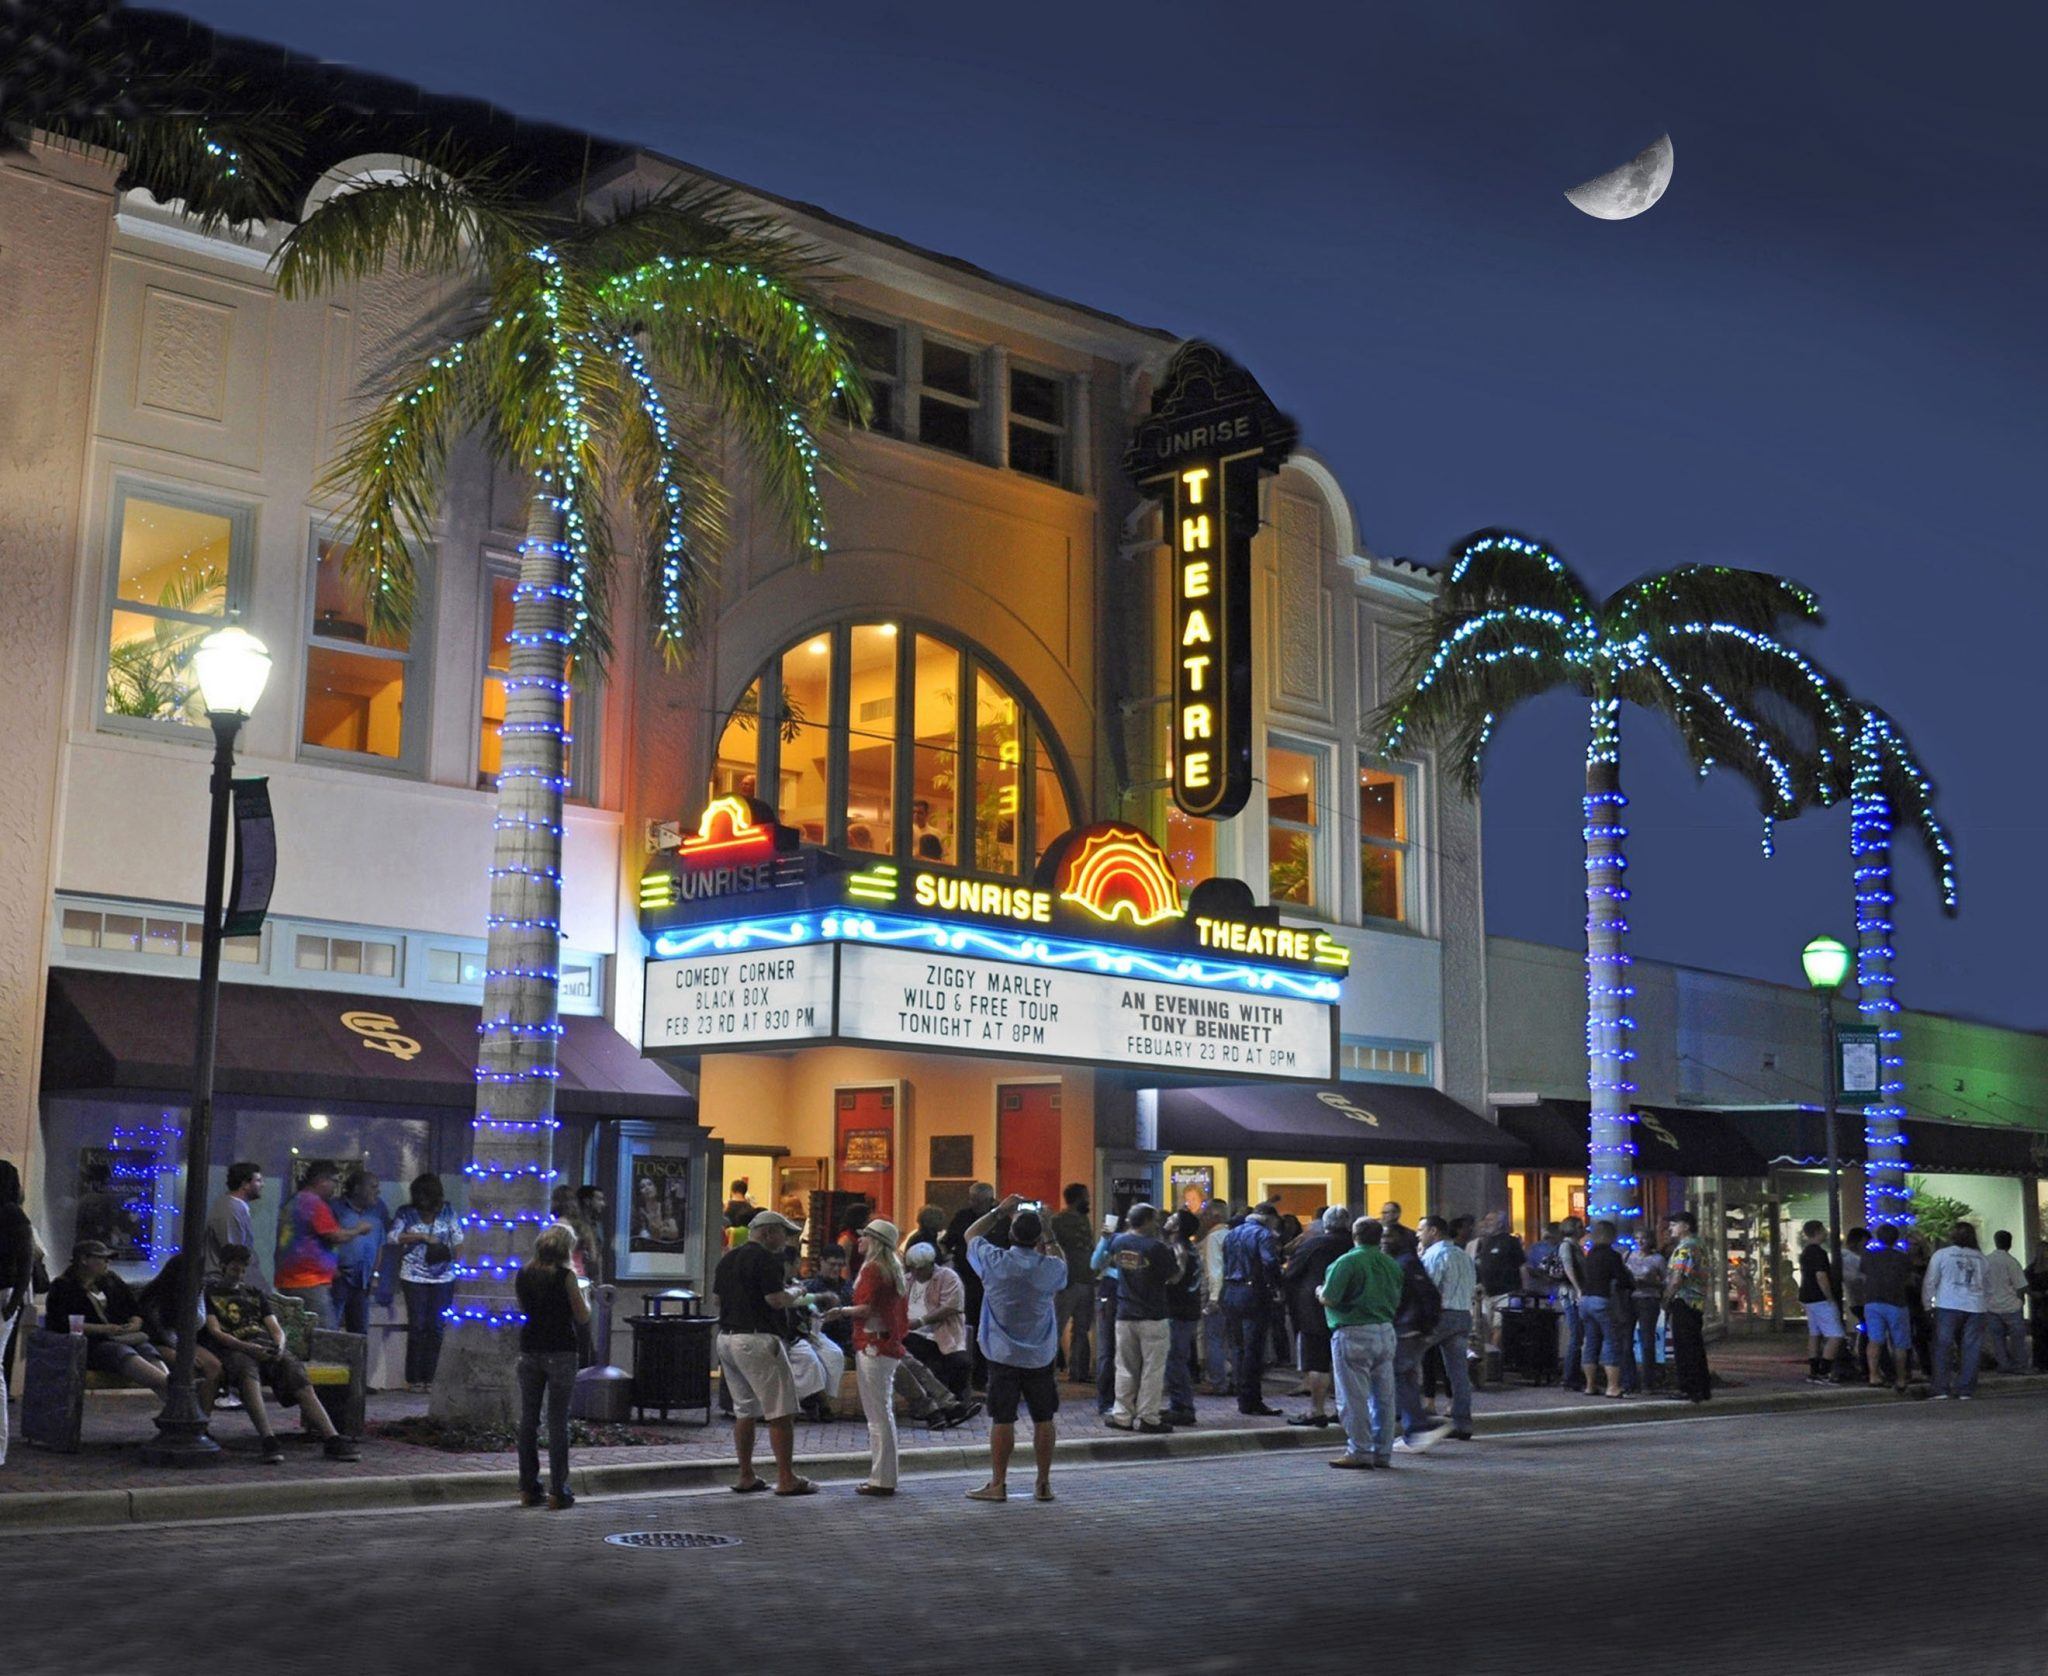 The Sunrise Theatre